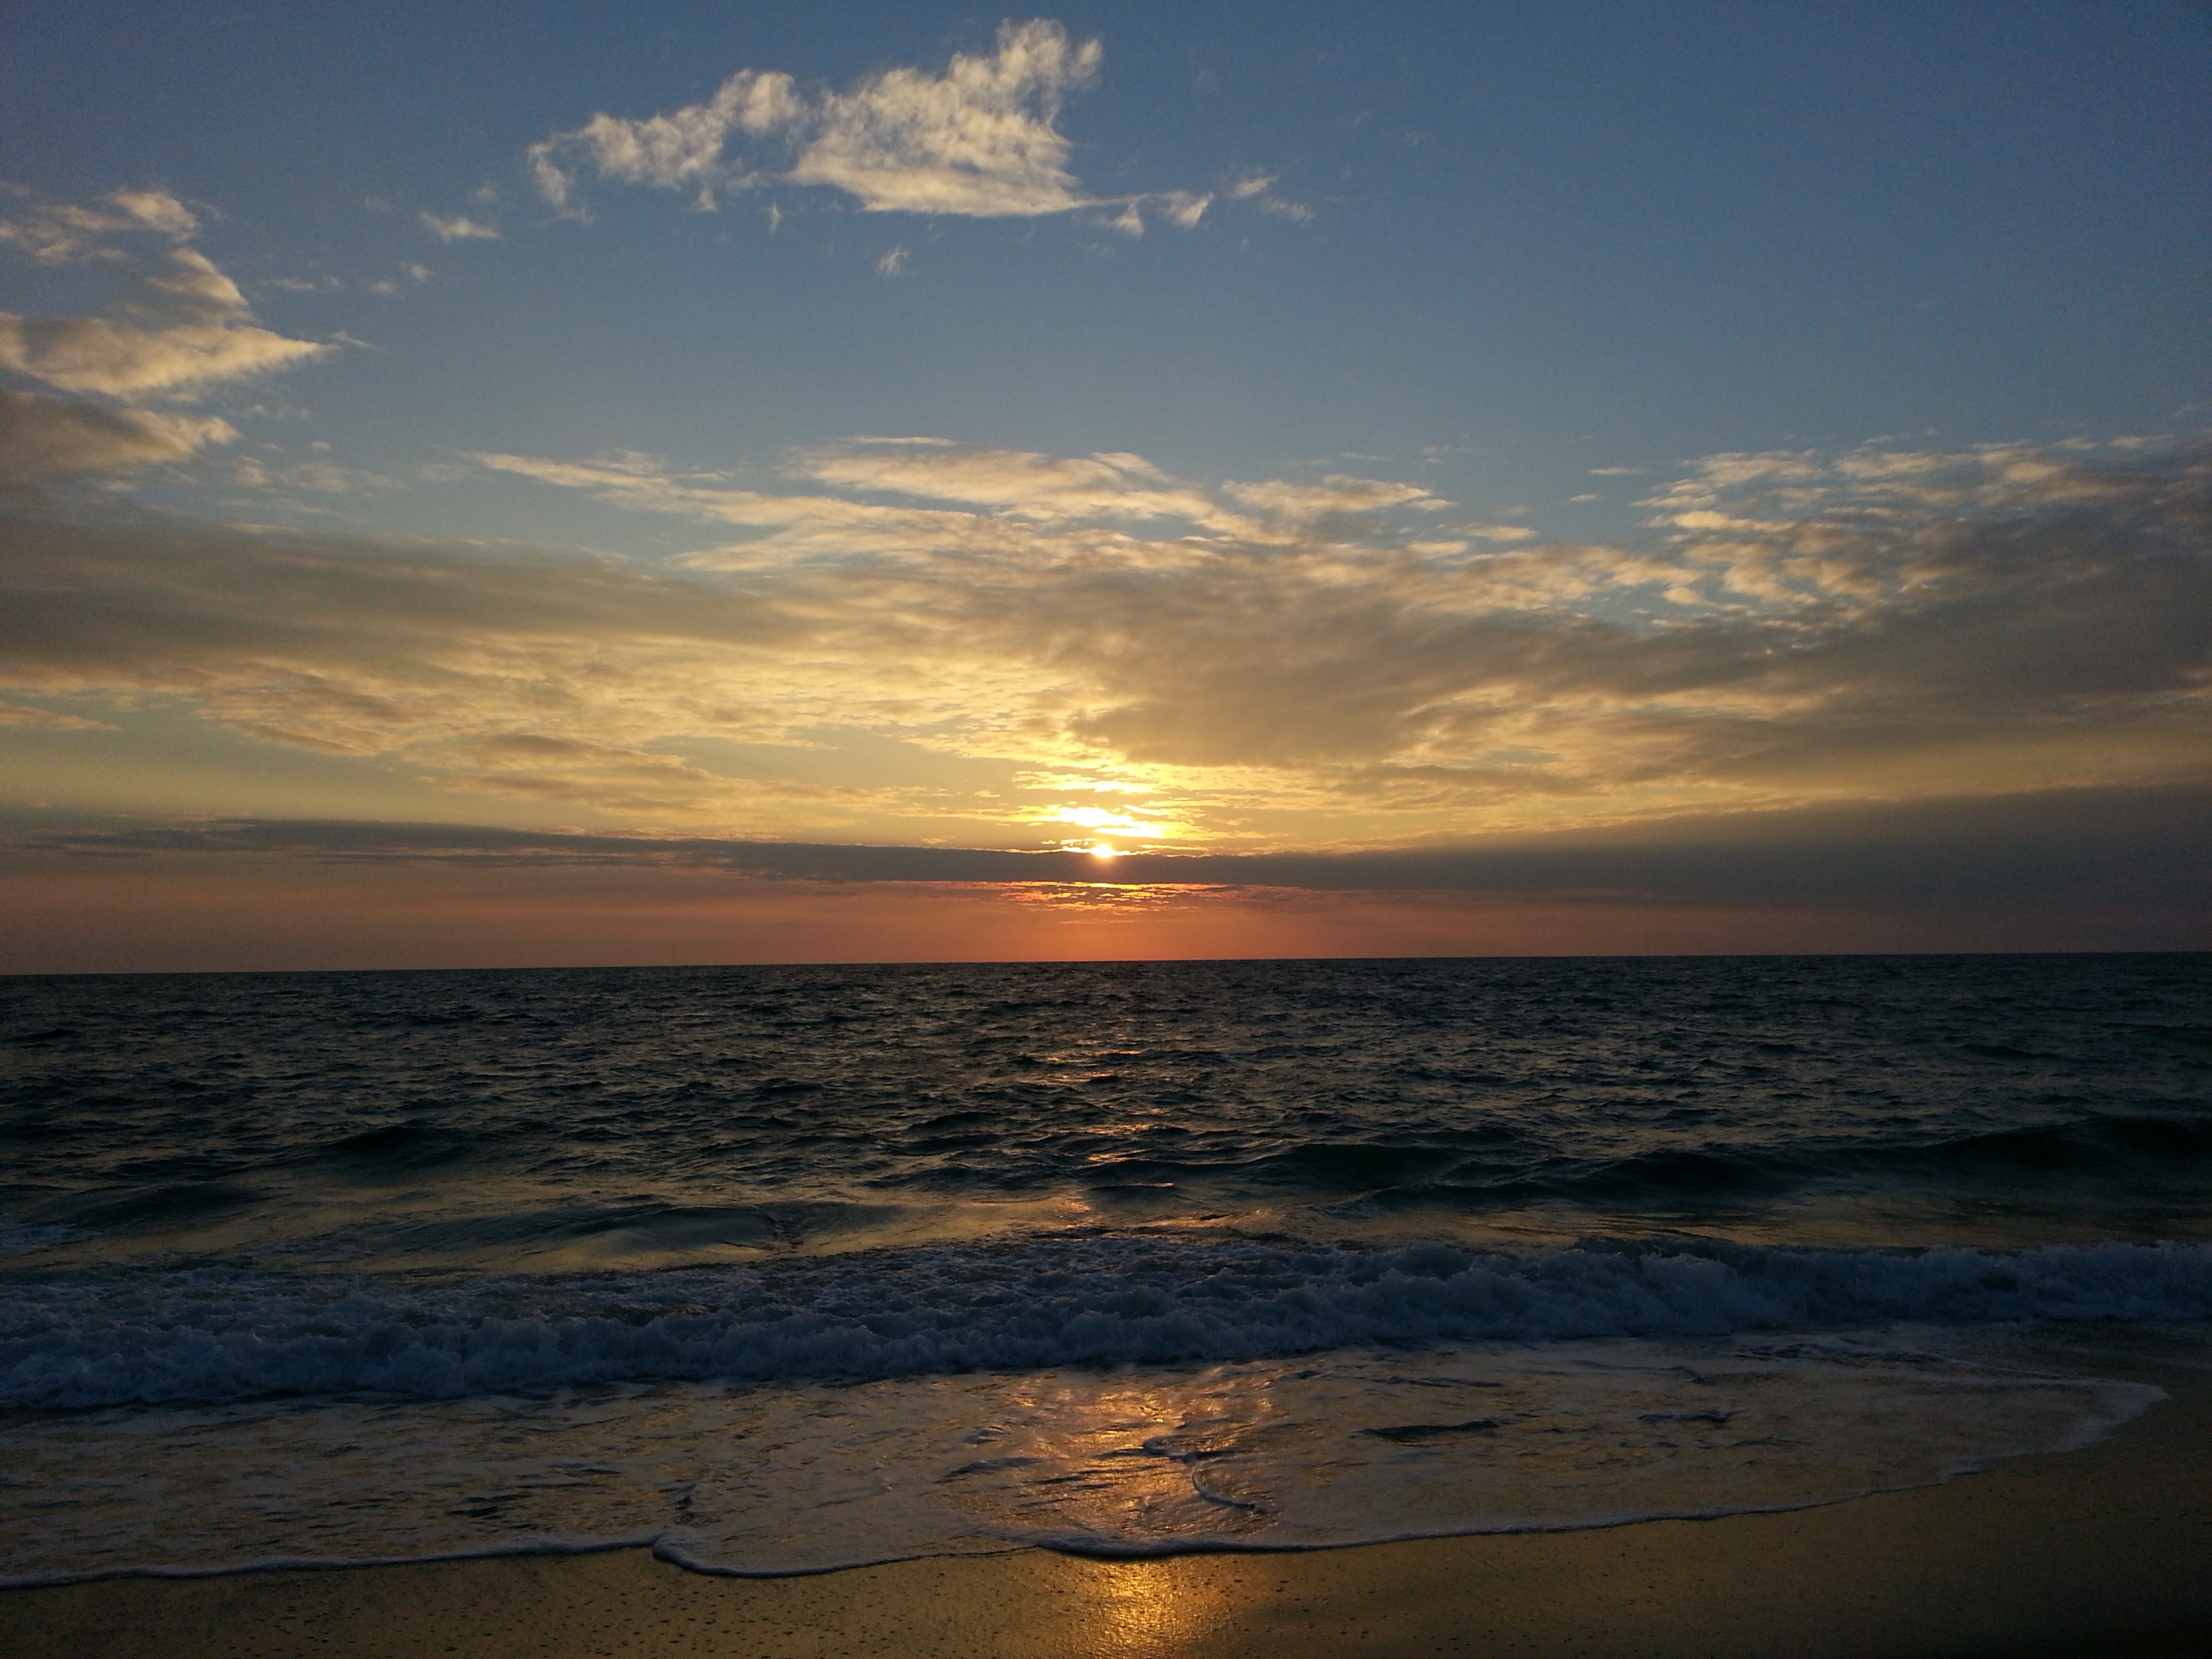 Beach Scenes Nags Head Cottage 3264x2448